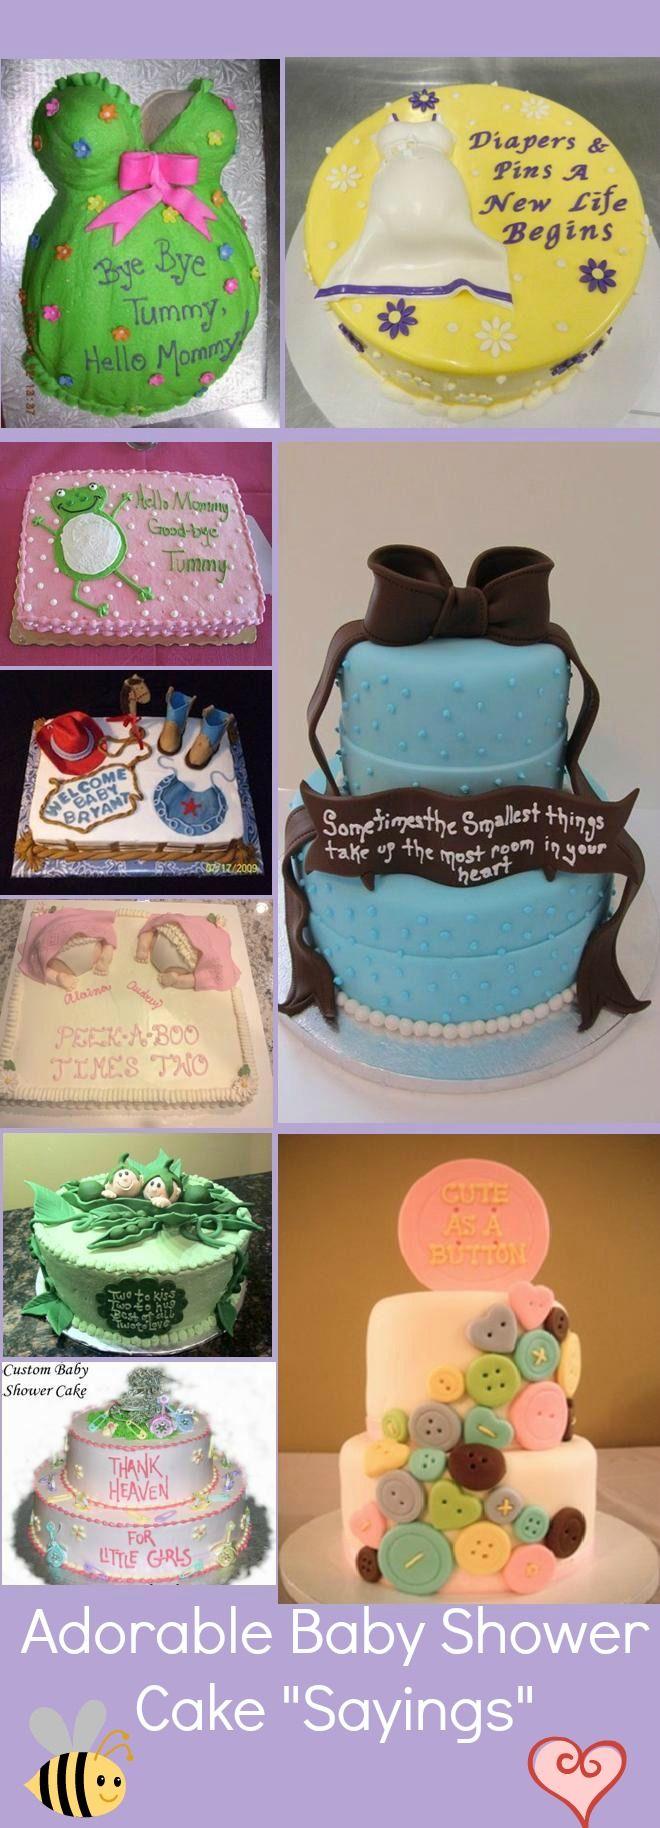 10 Adorable Baby Shower Cake Sayings.